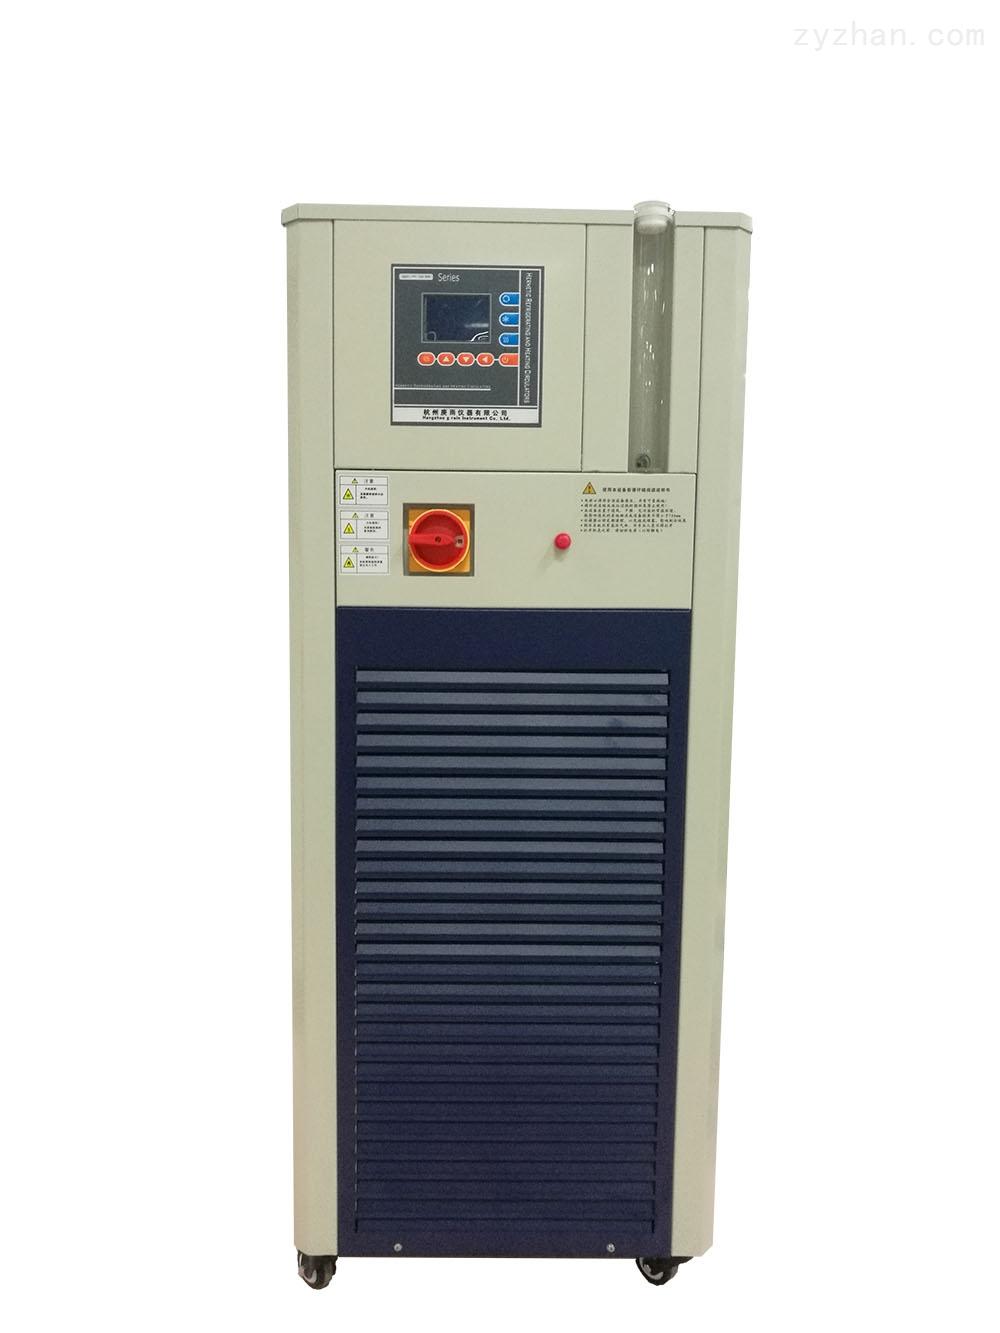 GDZT-100-200-40加热制冷循环器